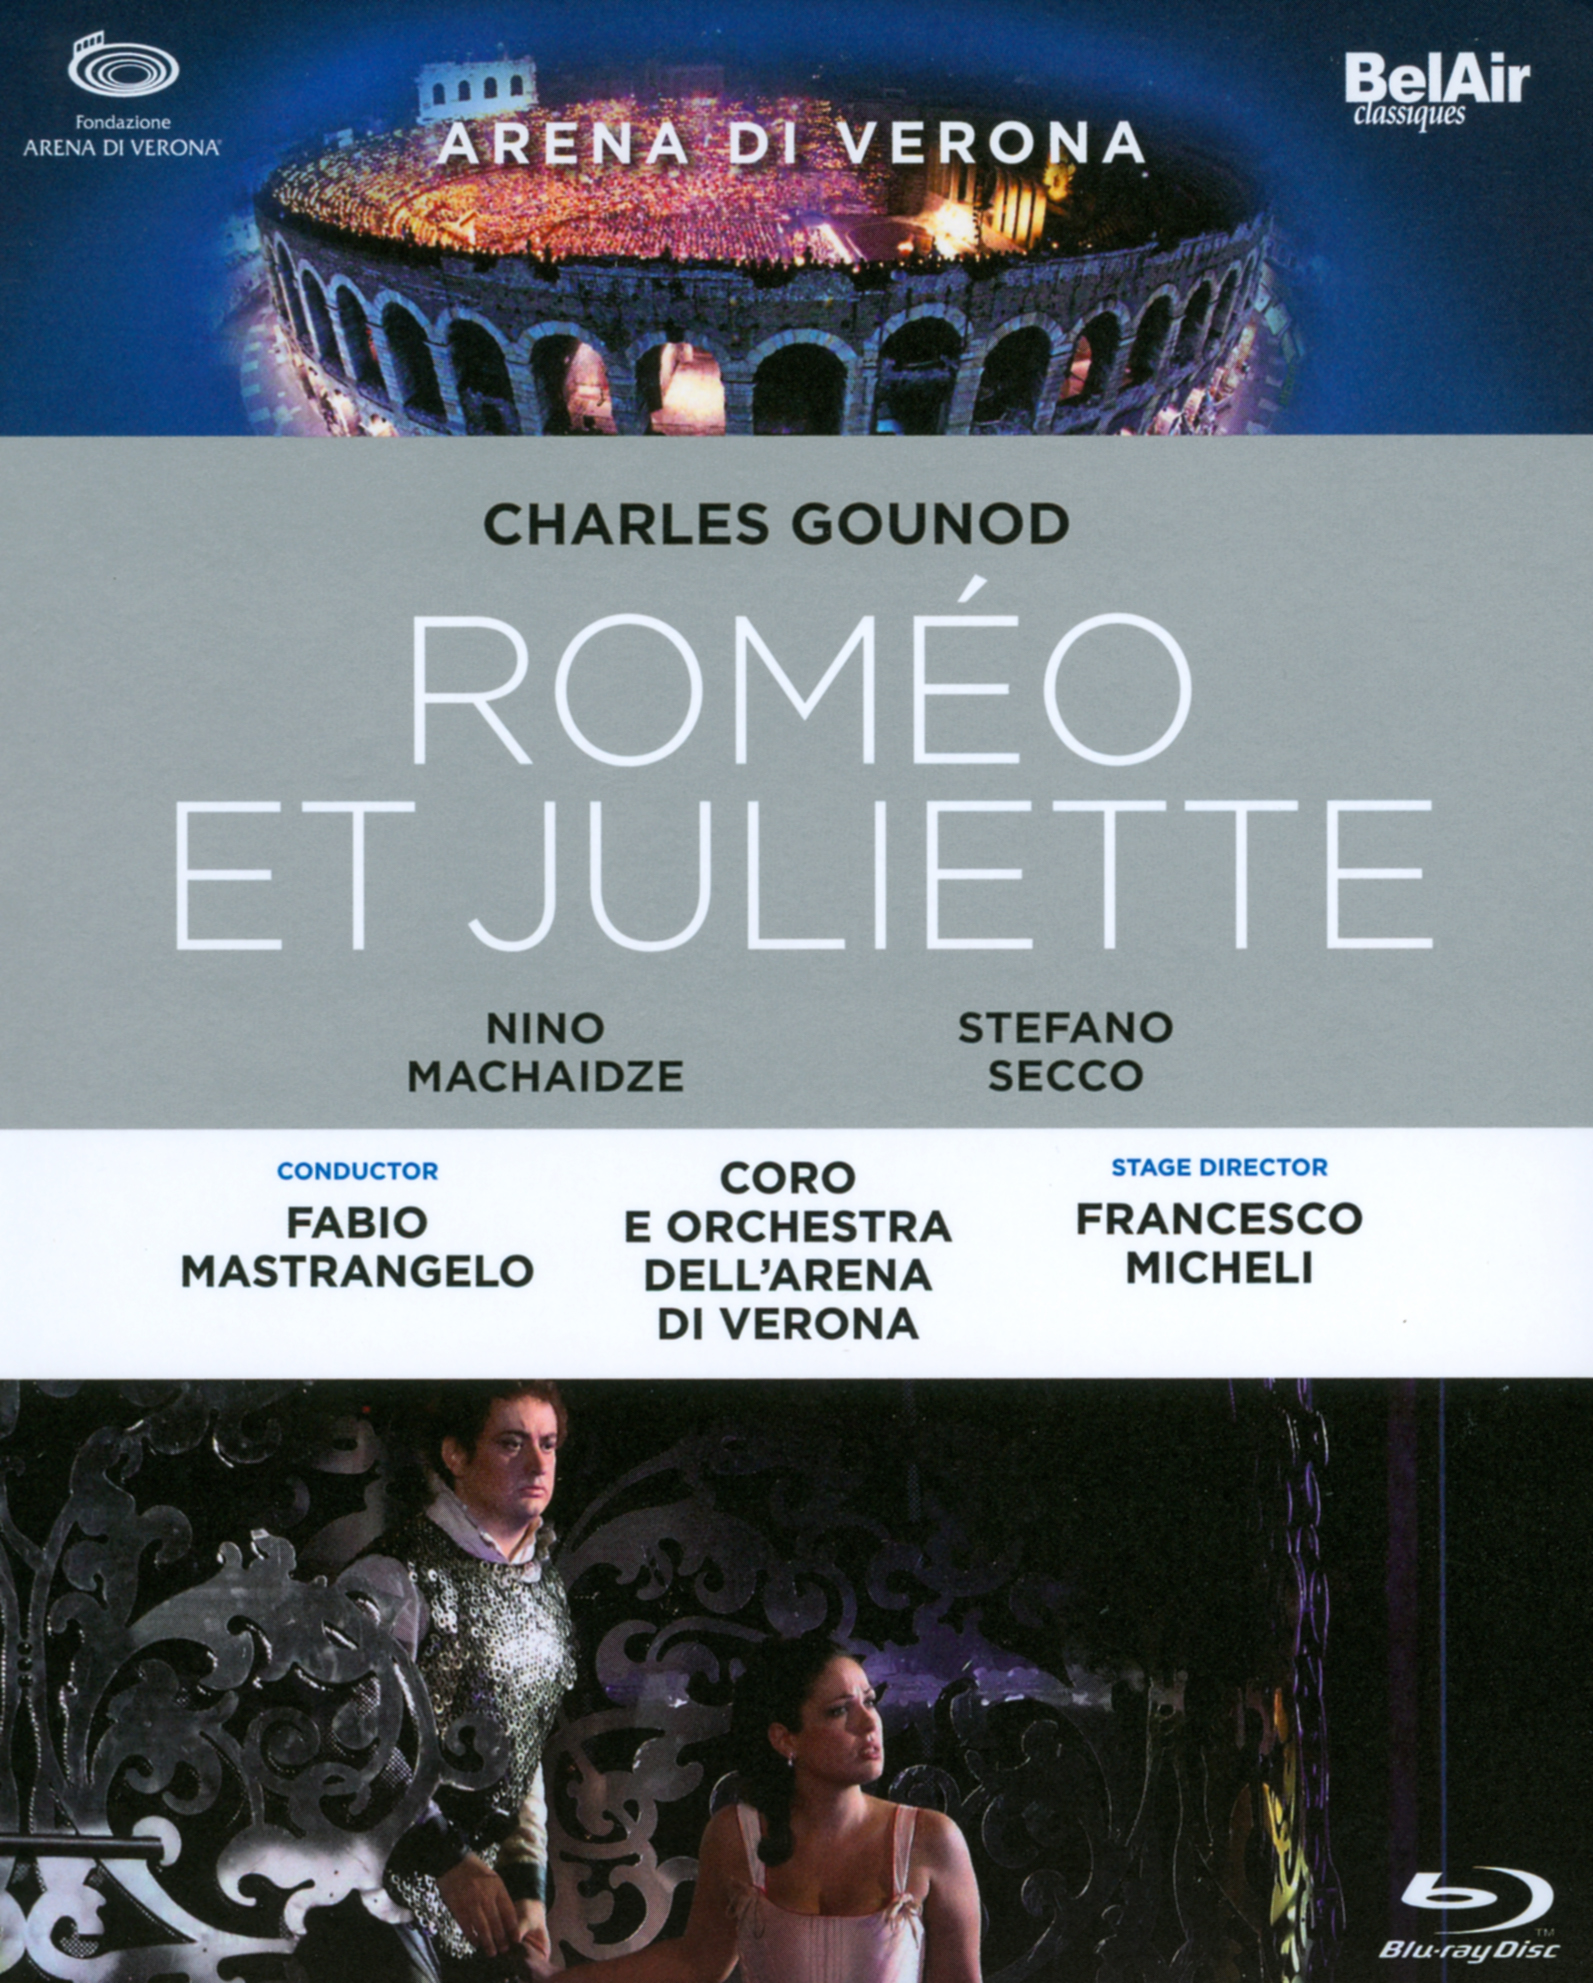 Romeo et Juliette (Arena di Verona)